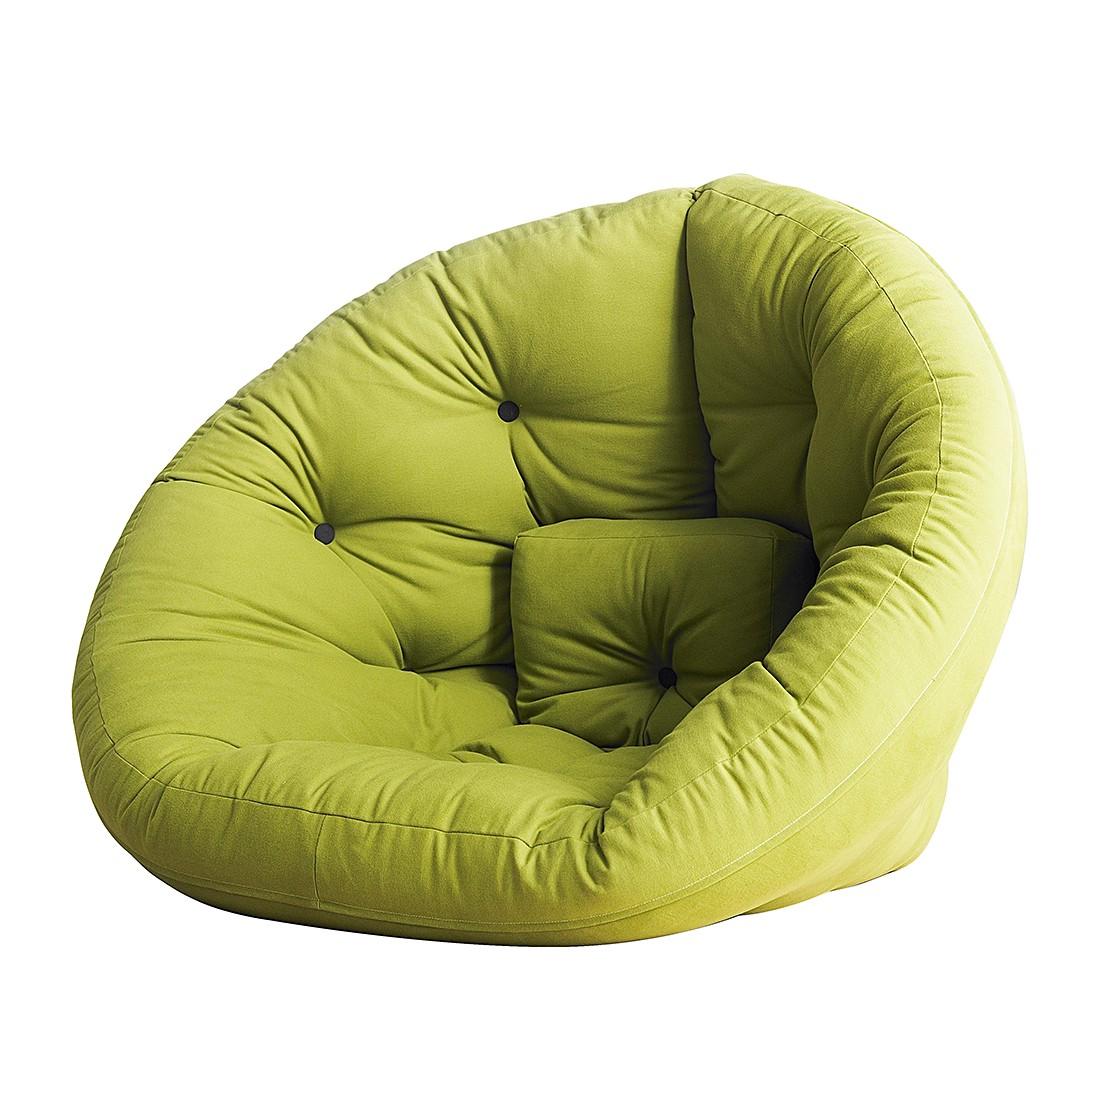 Fauteuil futon convertible Nest